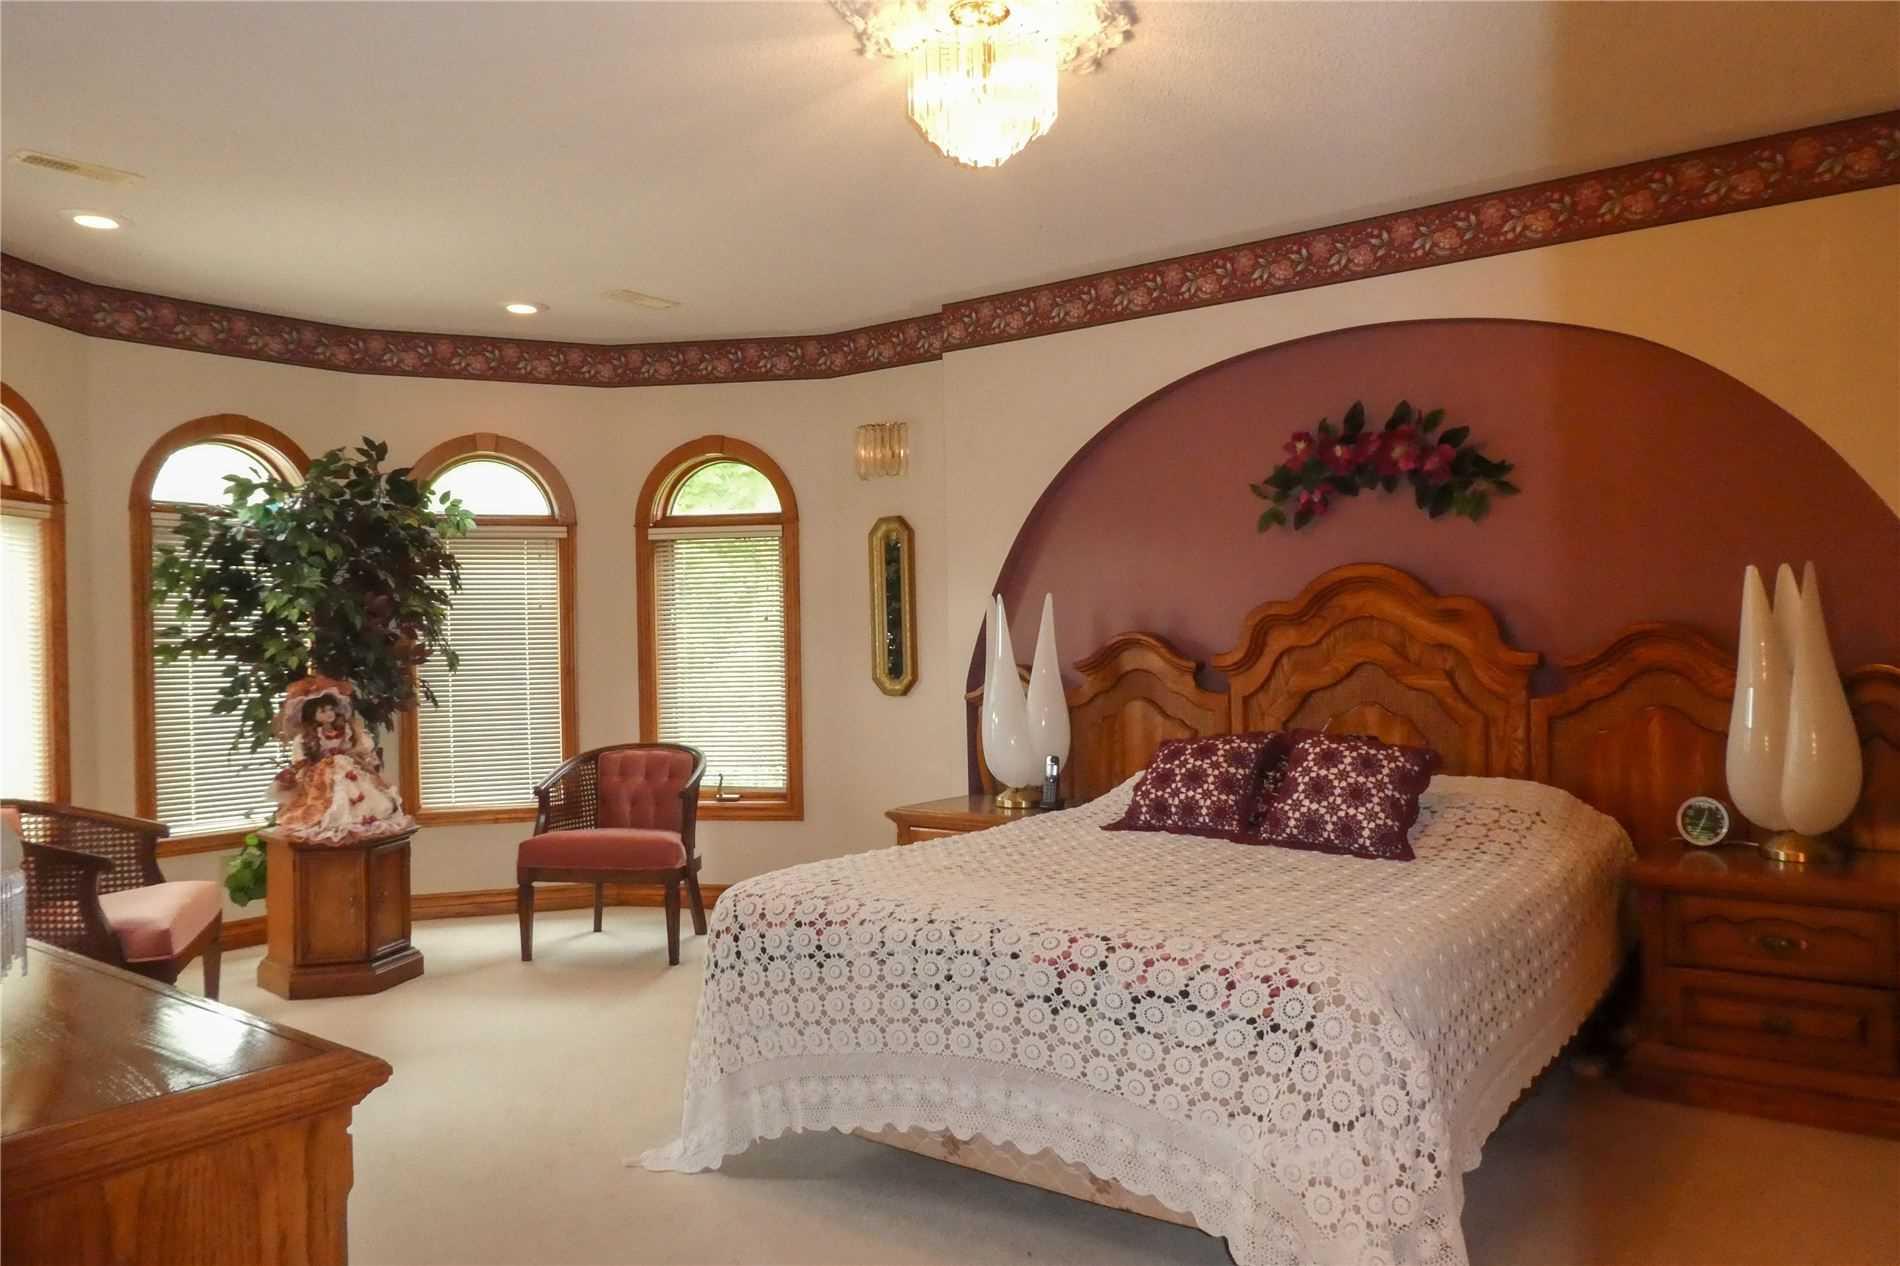 1036 Murphy Rd, Sarnia, Ontario N7S2Y2, 5 Bedrooms Bedrooms, 11 Rooms Rooms,4 BathroomsBathrooms,Detached,For Sale,Murphy,X5327654